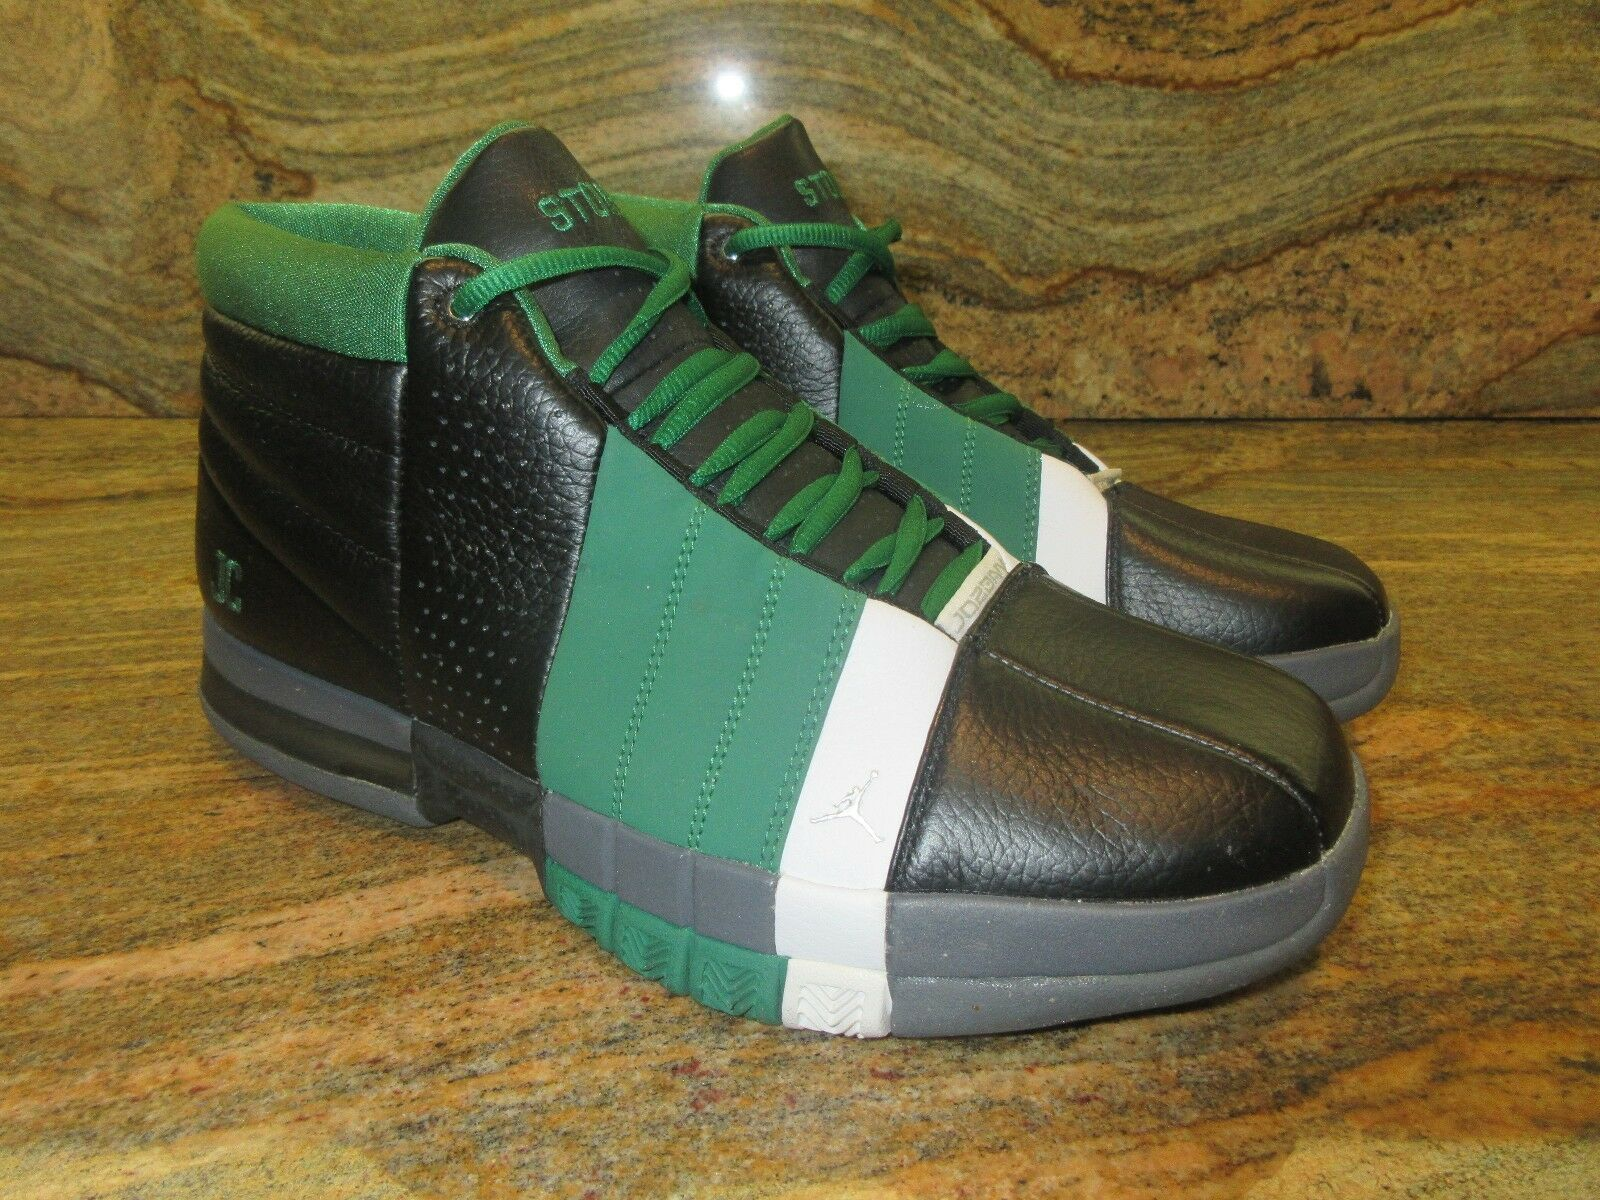 2008 Nike Air Jordan Team Elite iD SZ 9.5 Boston Celtics Green Retro 329187-991